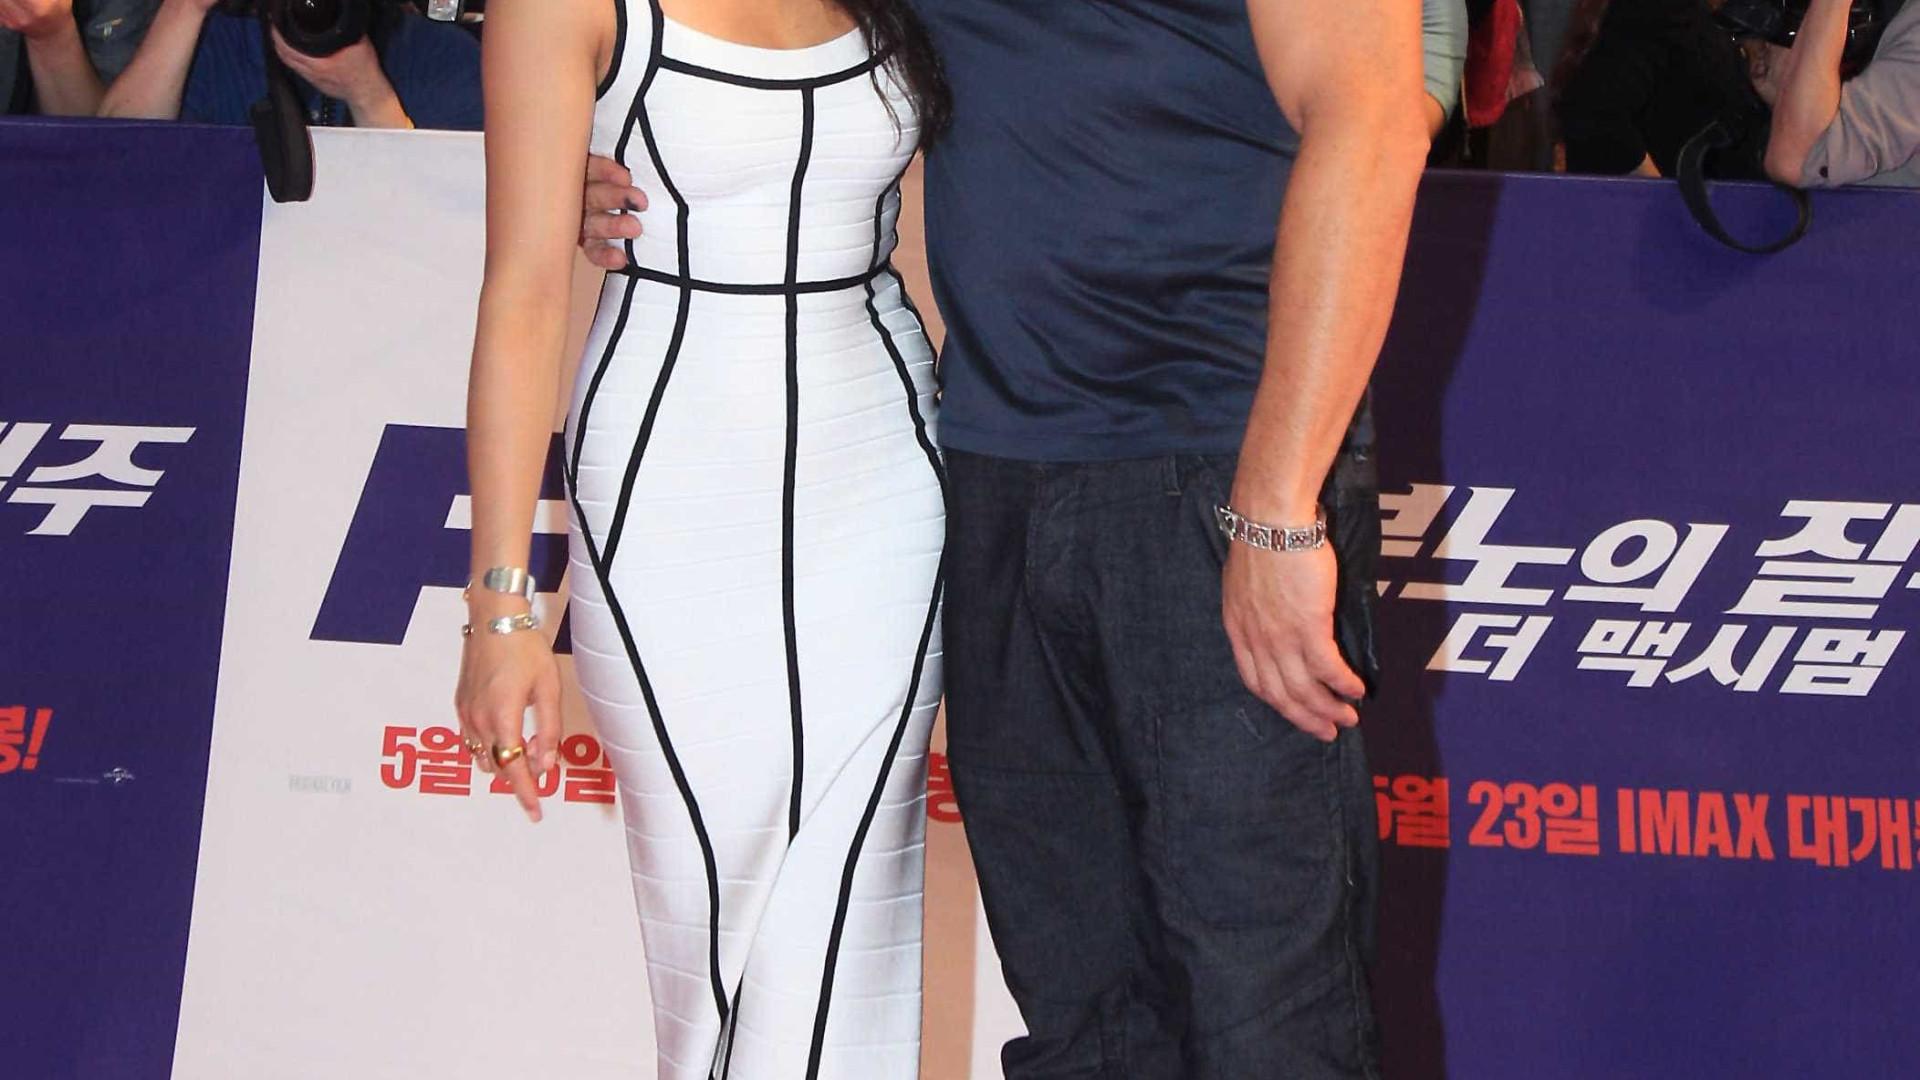 Michelle Rodriguez agradece Vin Diesel: 'Você é um apoiador das mulheres fortes'